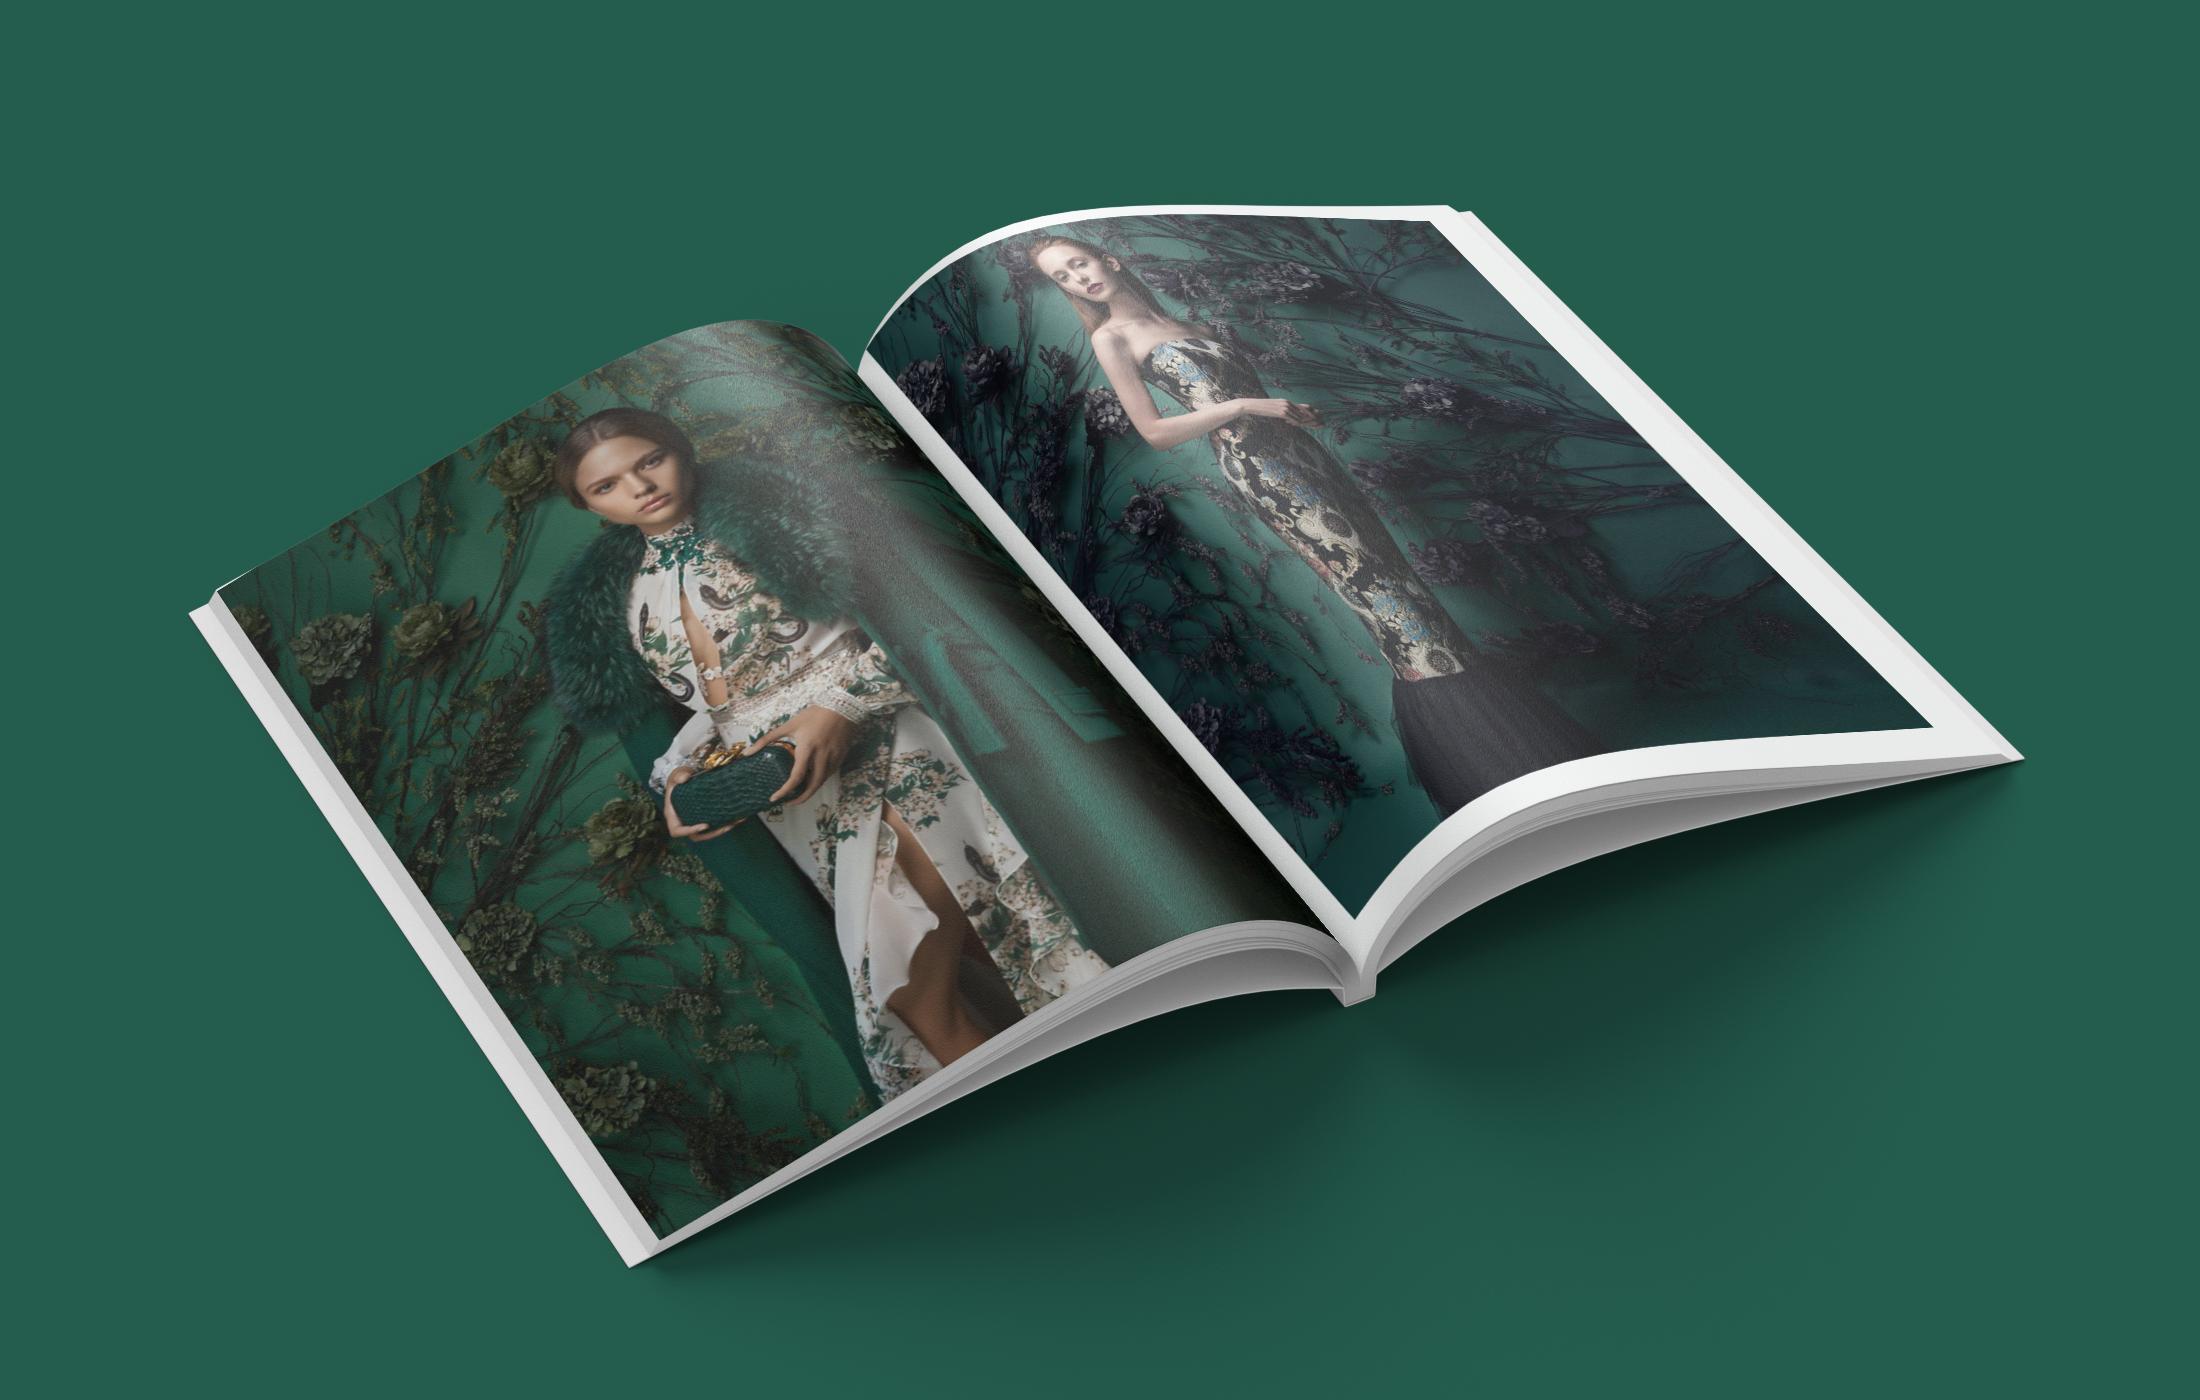 Model Citizen Magazine Issue 35, Macky Suson, Fashion Inclusion Now3.png